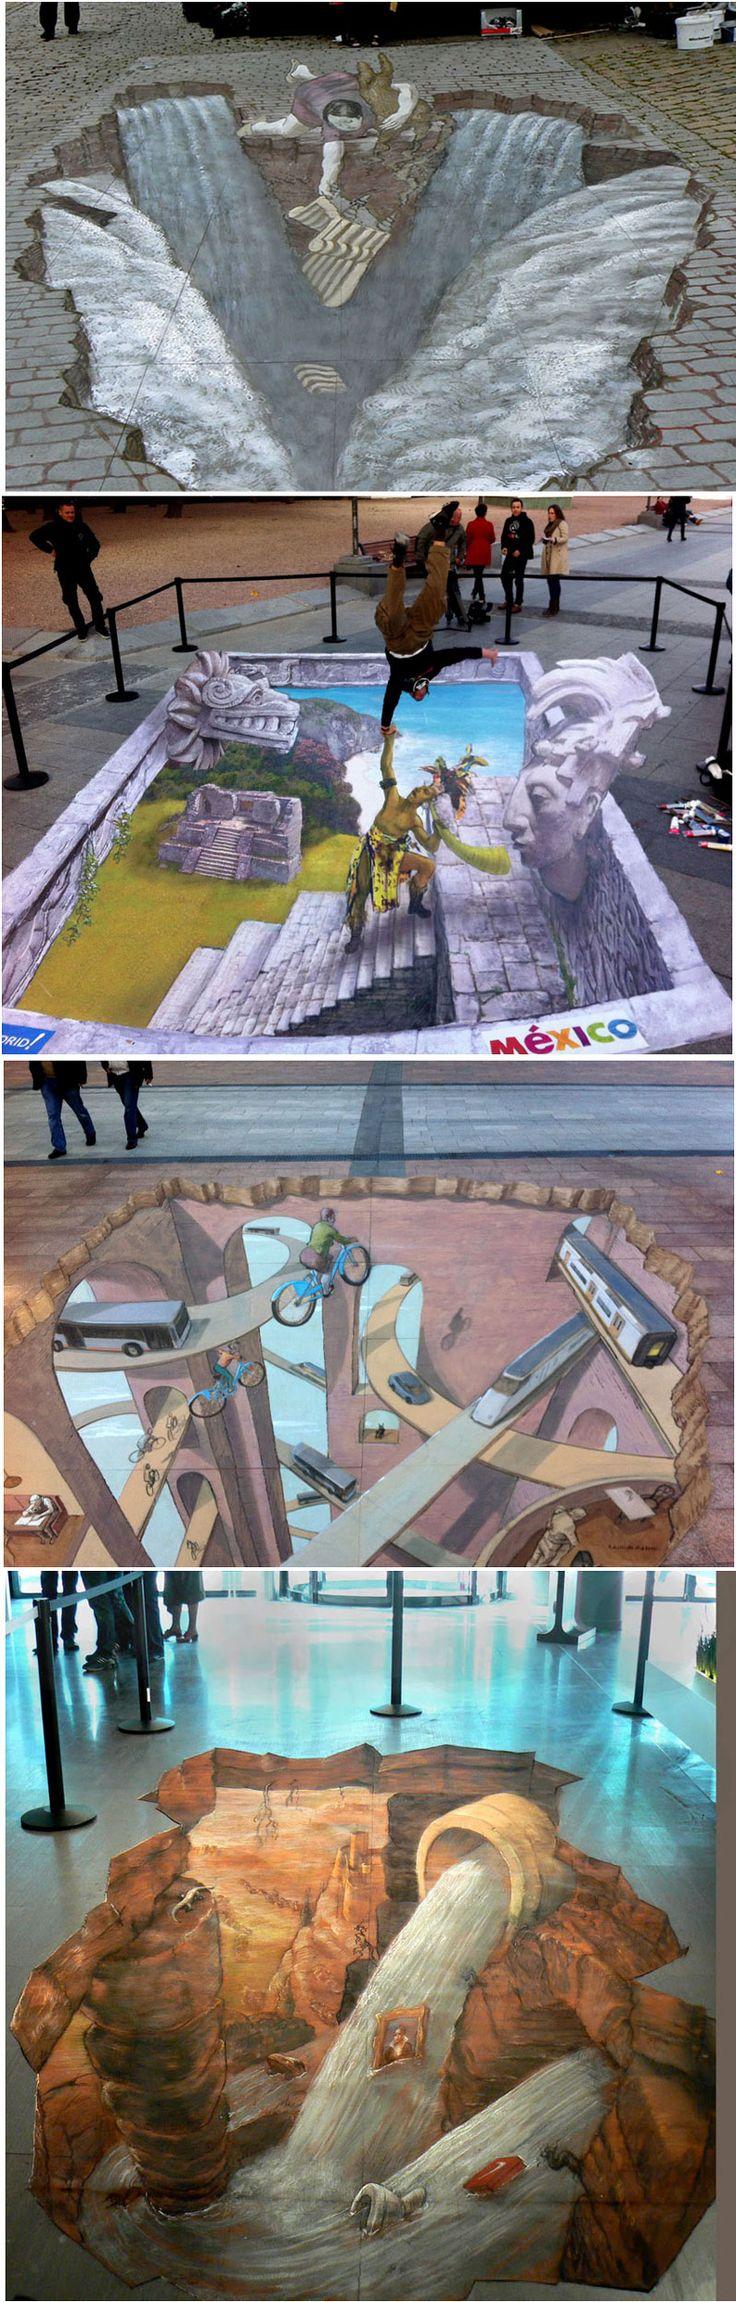 Eduardo Relero 3D pavement art